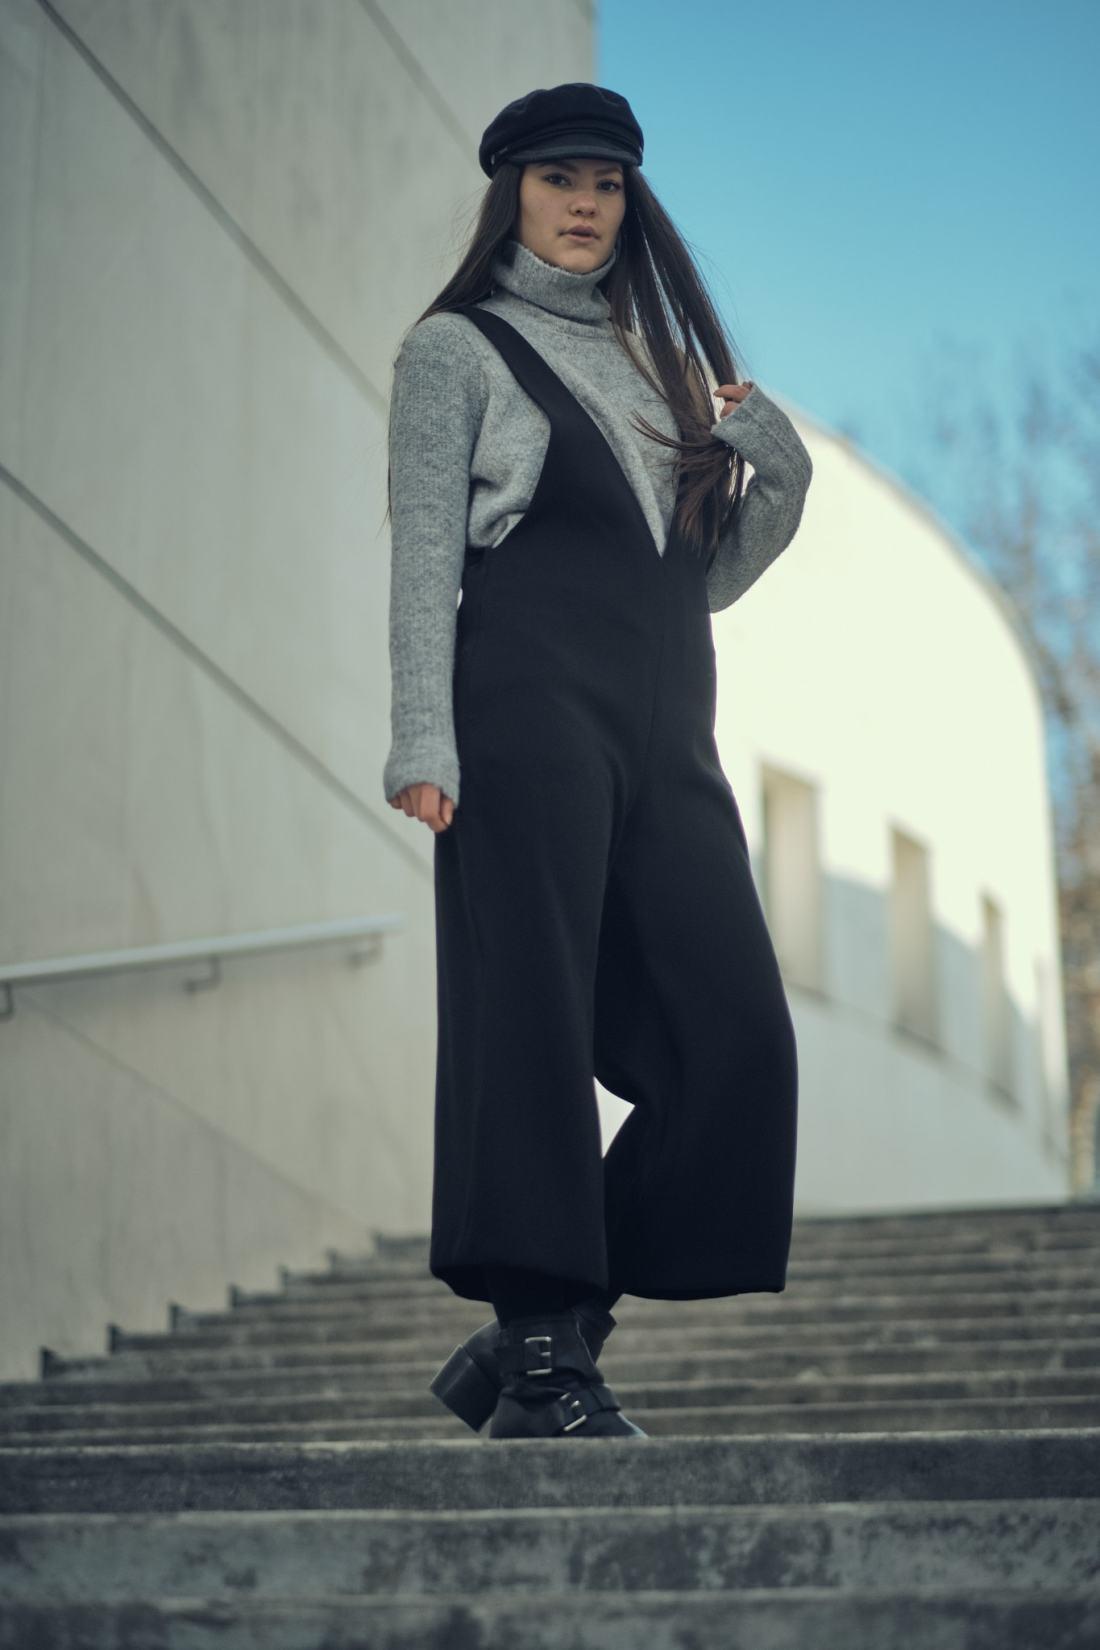 casquette-marin-fashion-blogger-blog-mode-paris-7-min